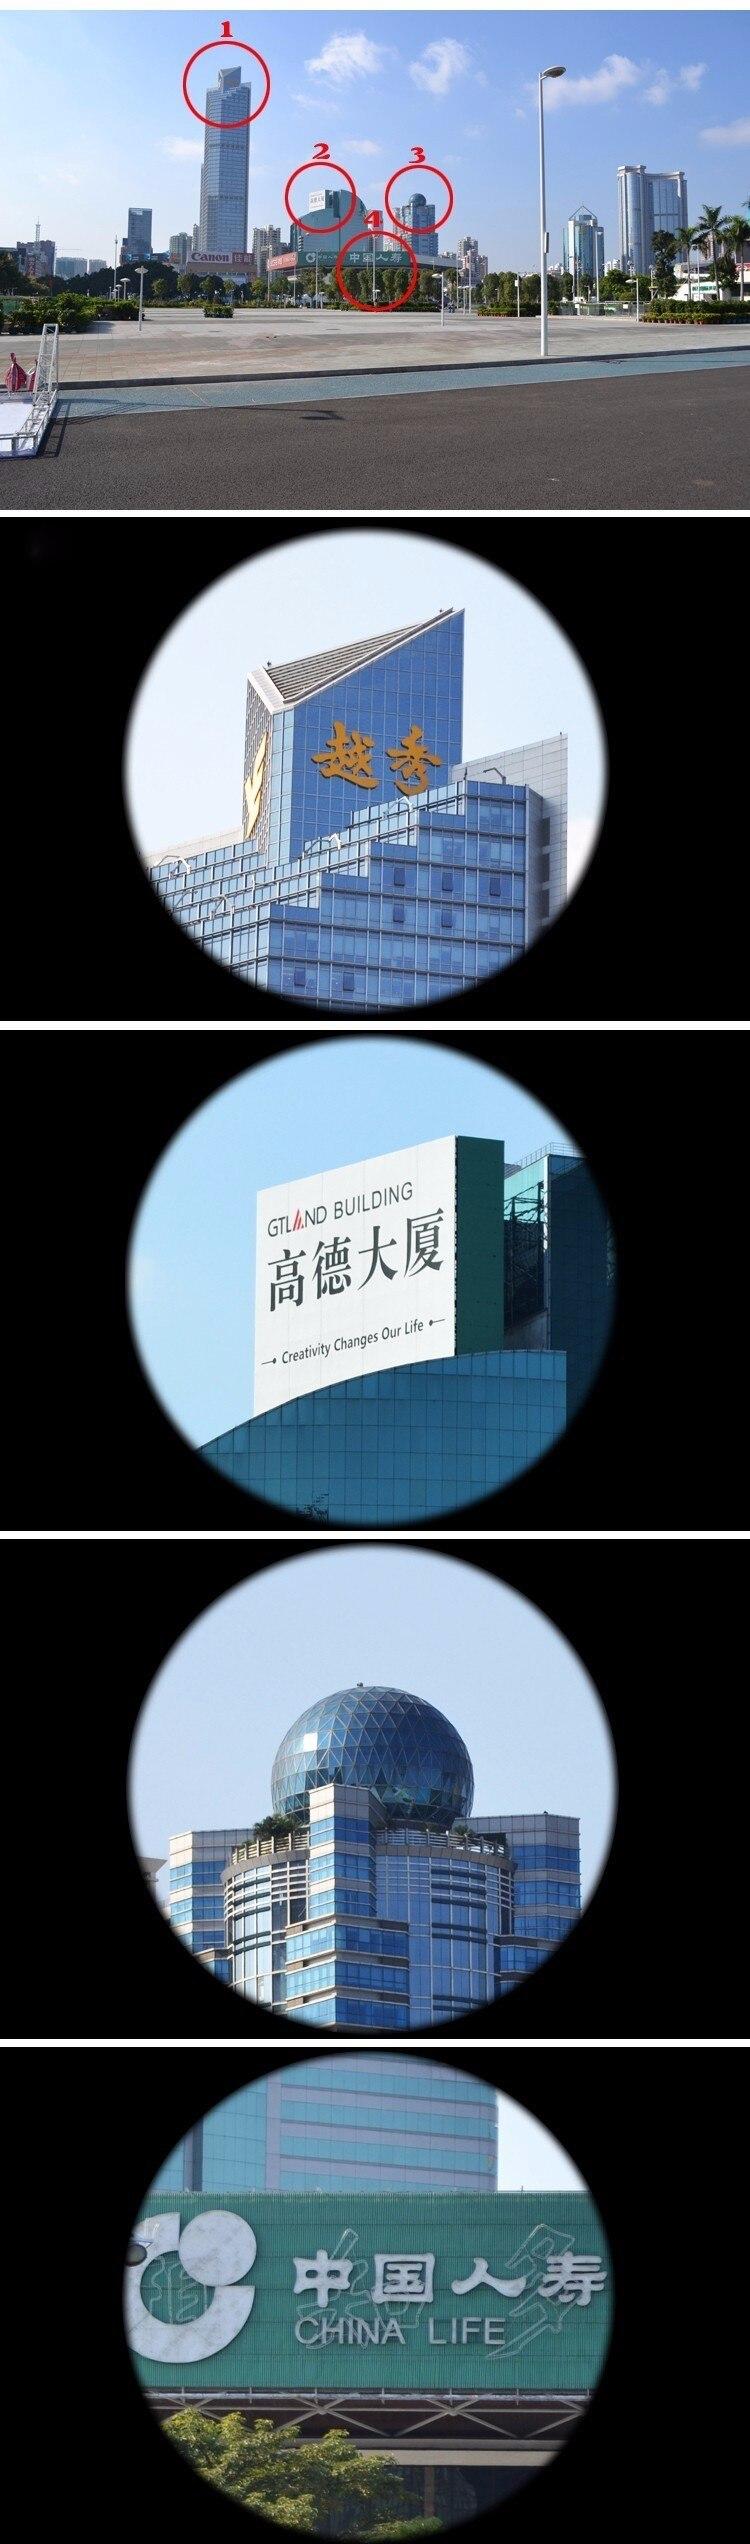 12in1 Camera Lens Kits 8x Zoom Telephoto Lentes Fisheye Wide Angle Macro Lens For iPhone 5 5C 5S SE 6 6S 7 Plus 8 X Phone Lenses 21